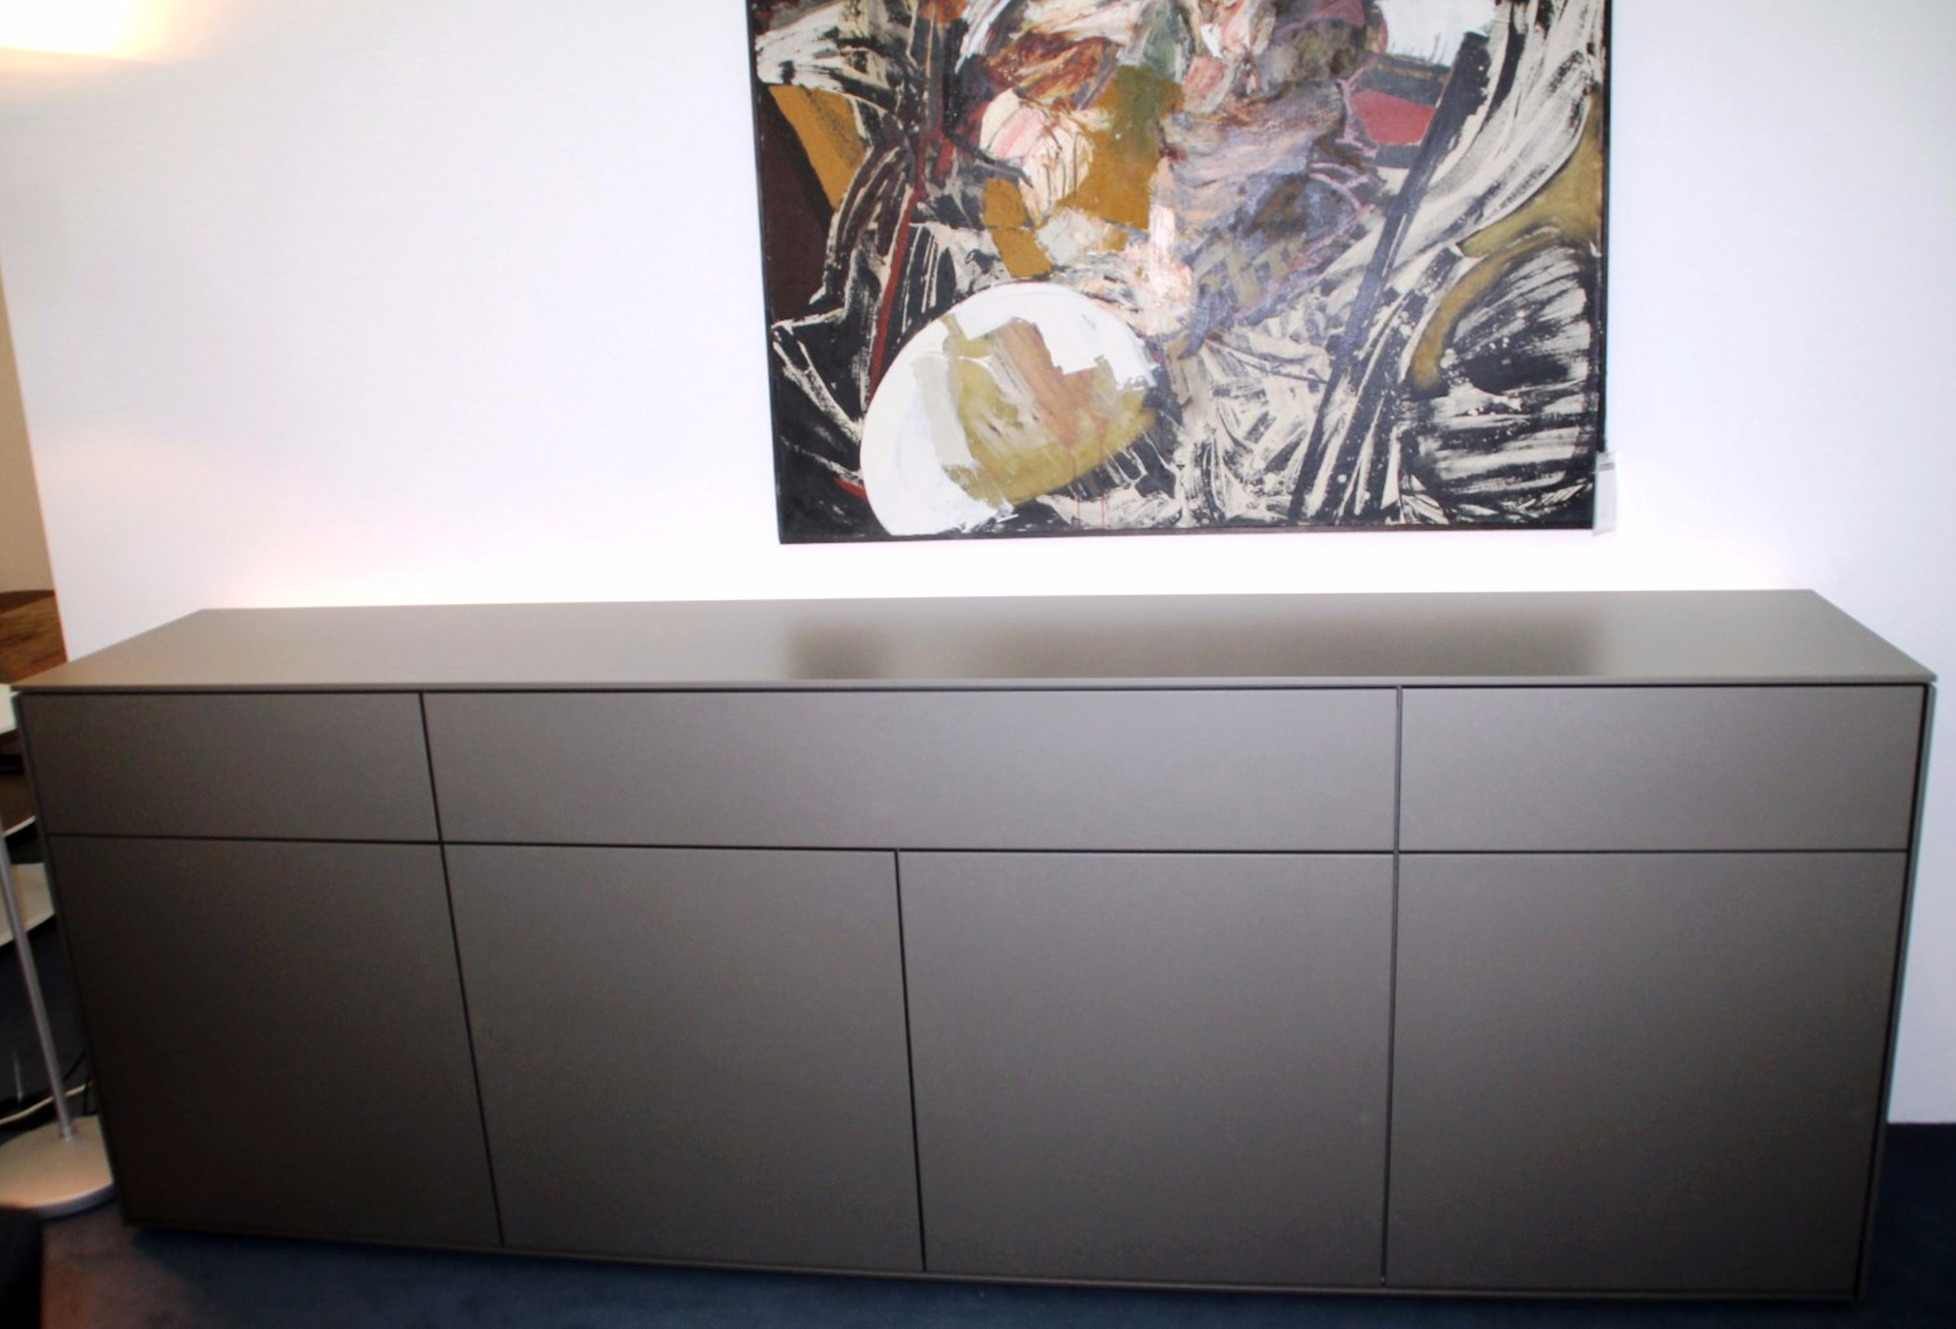 cube gap kommodenprogramm von interl bke. Black Bedroom Furniture Sets. Home Design Ideas